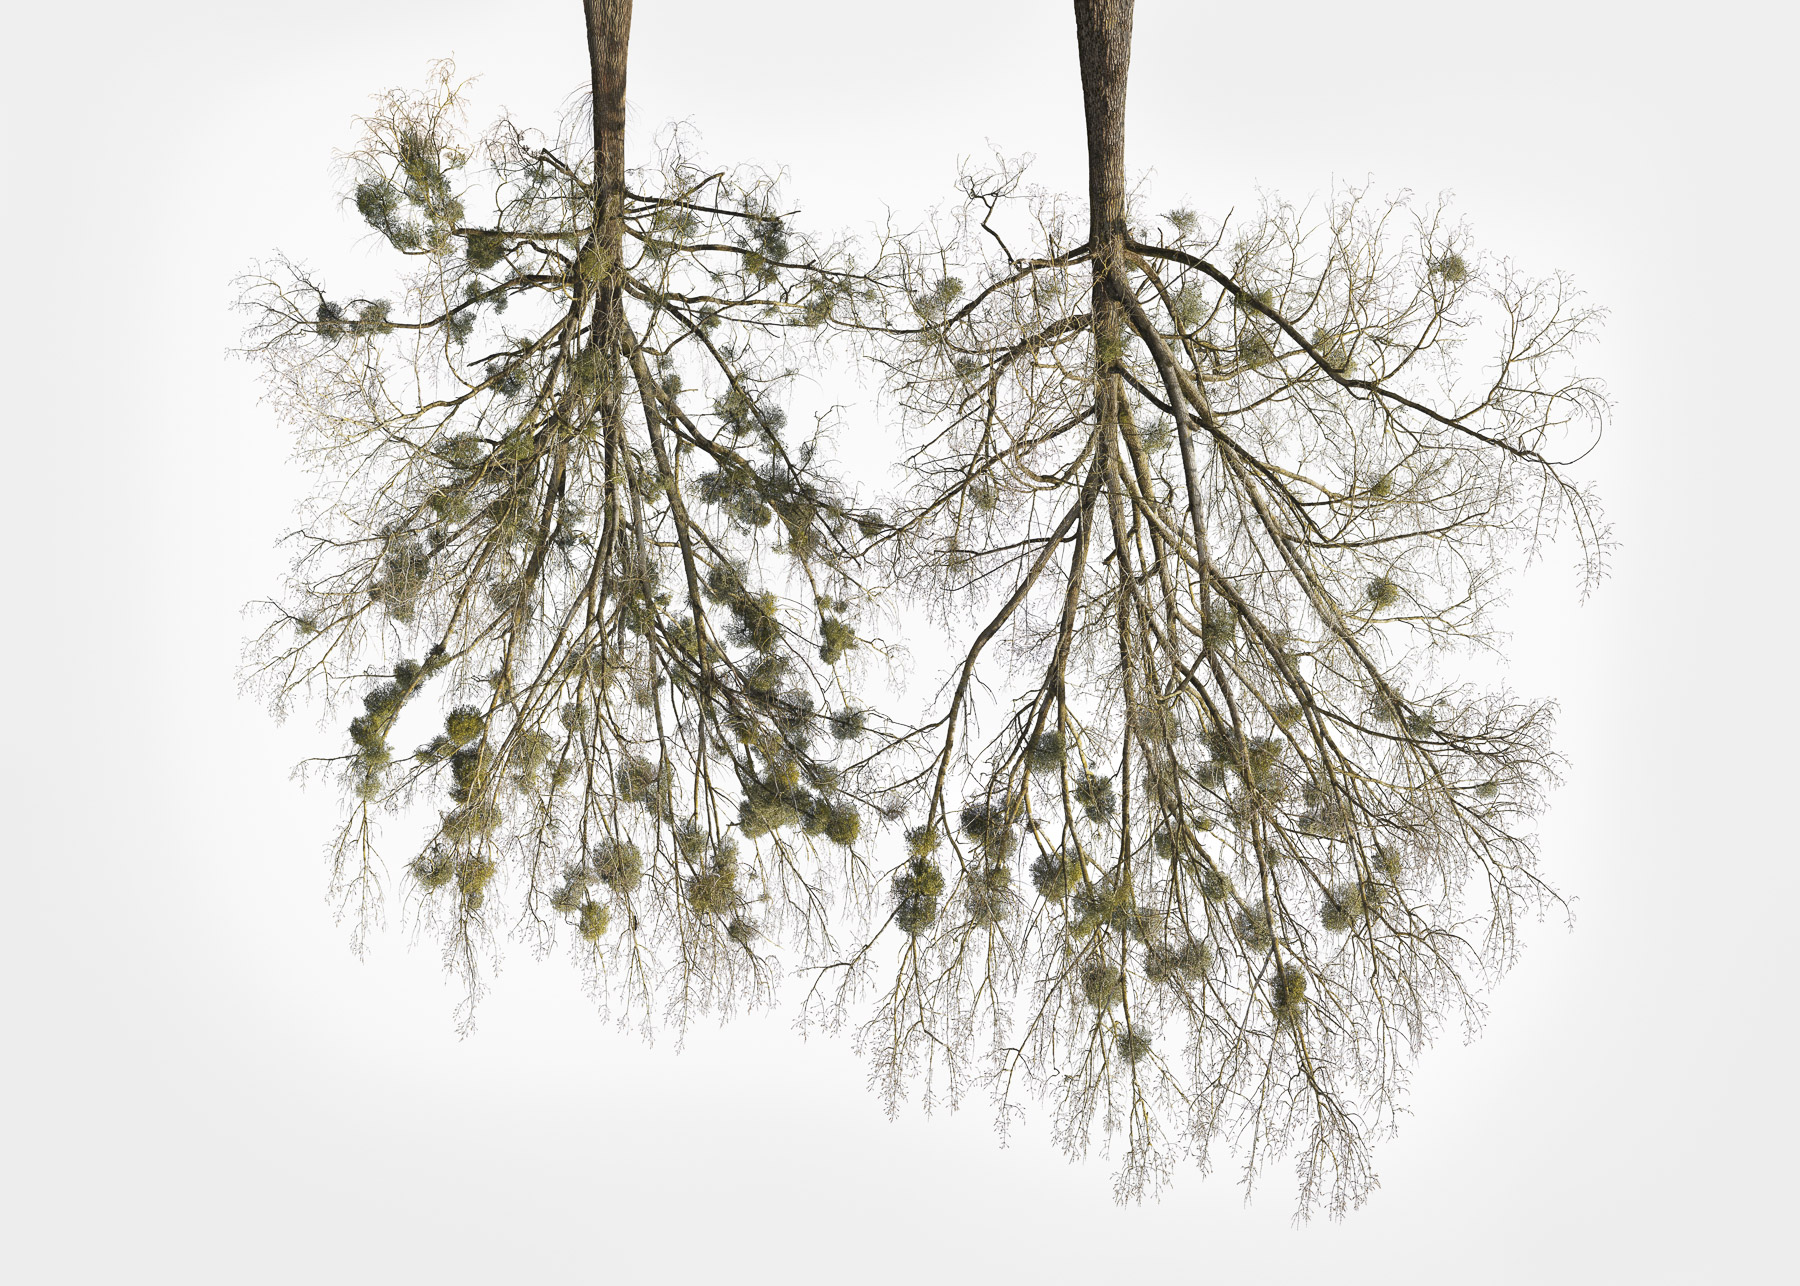 Christoph_Franke_Tree-Crowns_TC-27_05.jpg